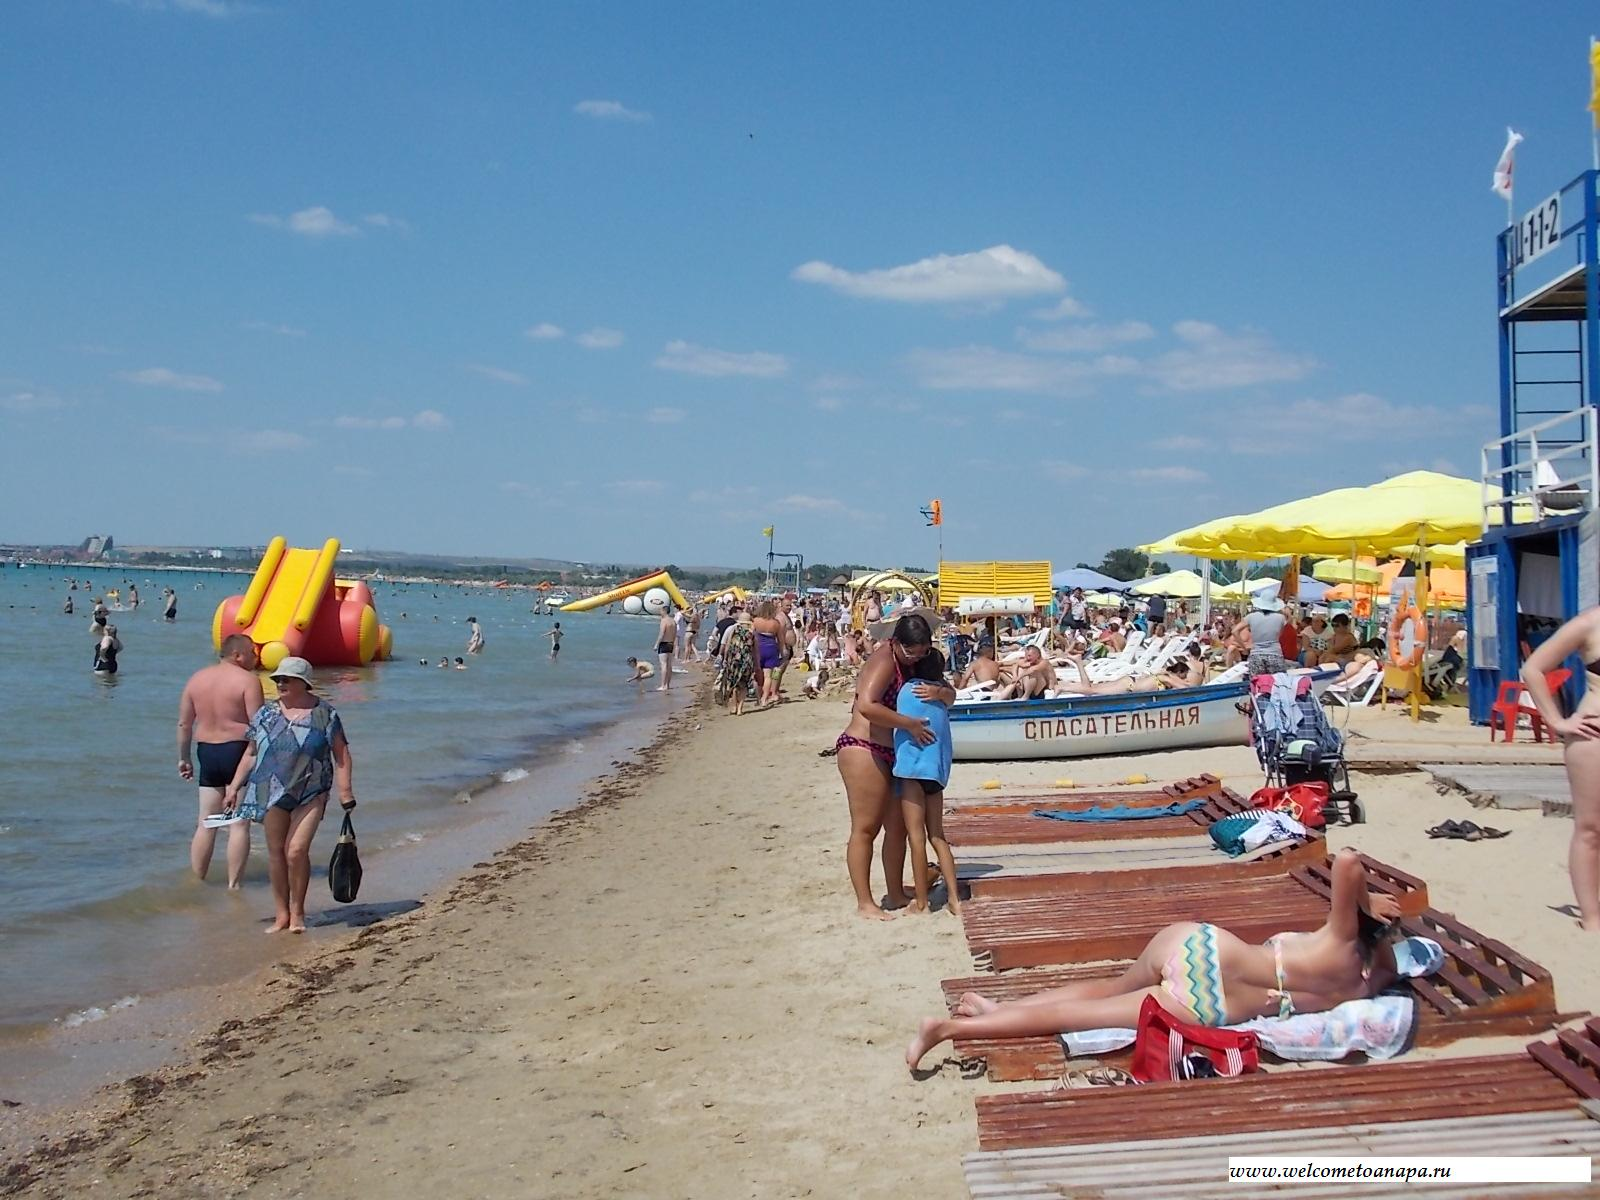 Г анапа фото пляжей